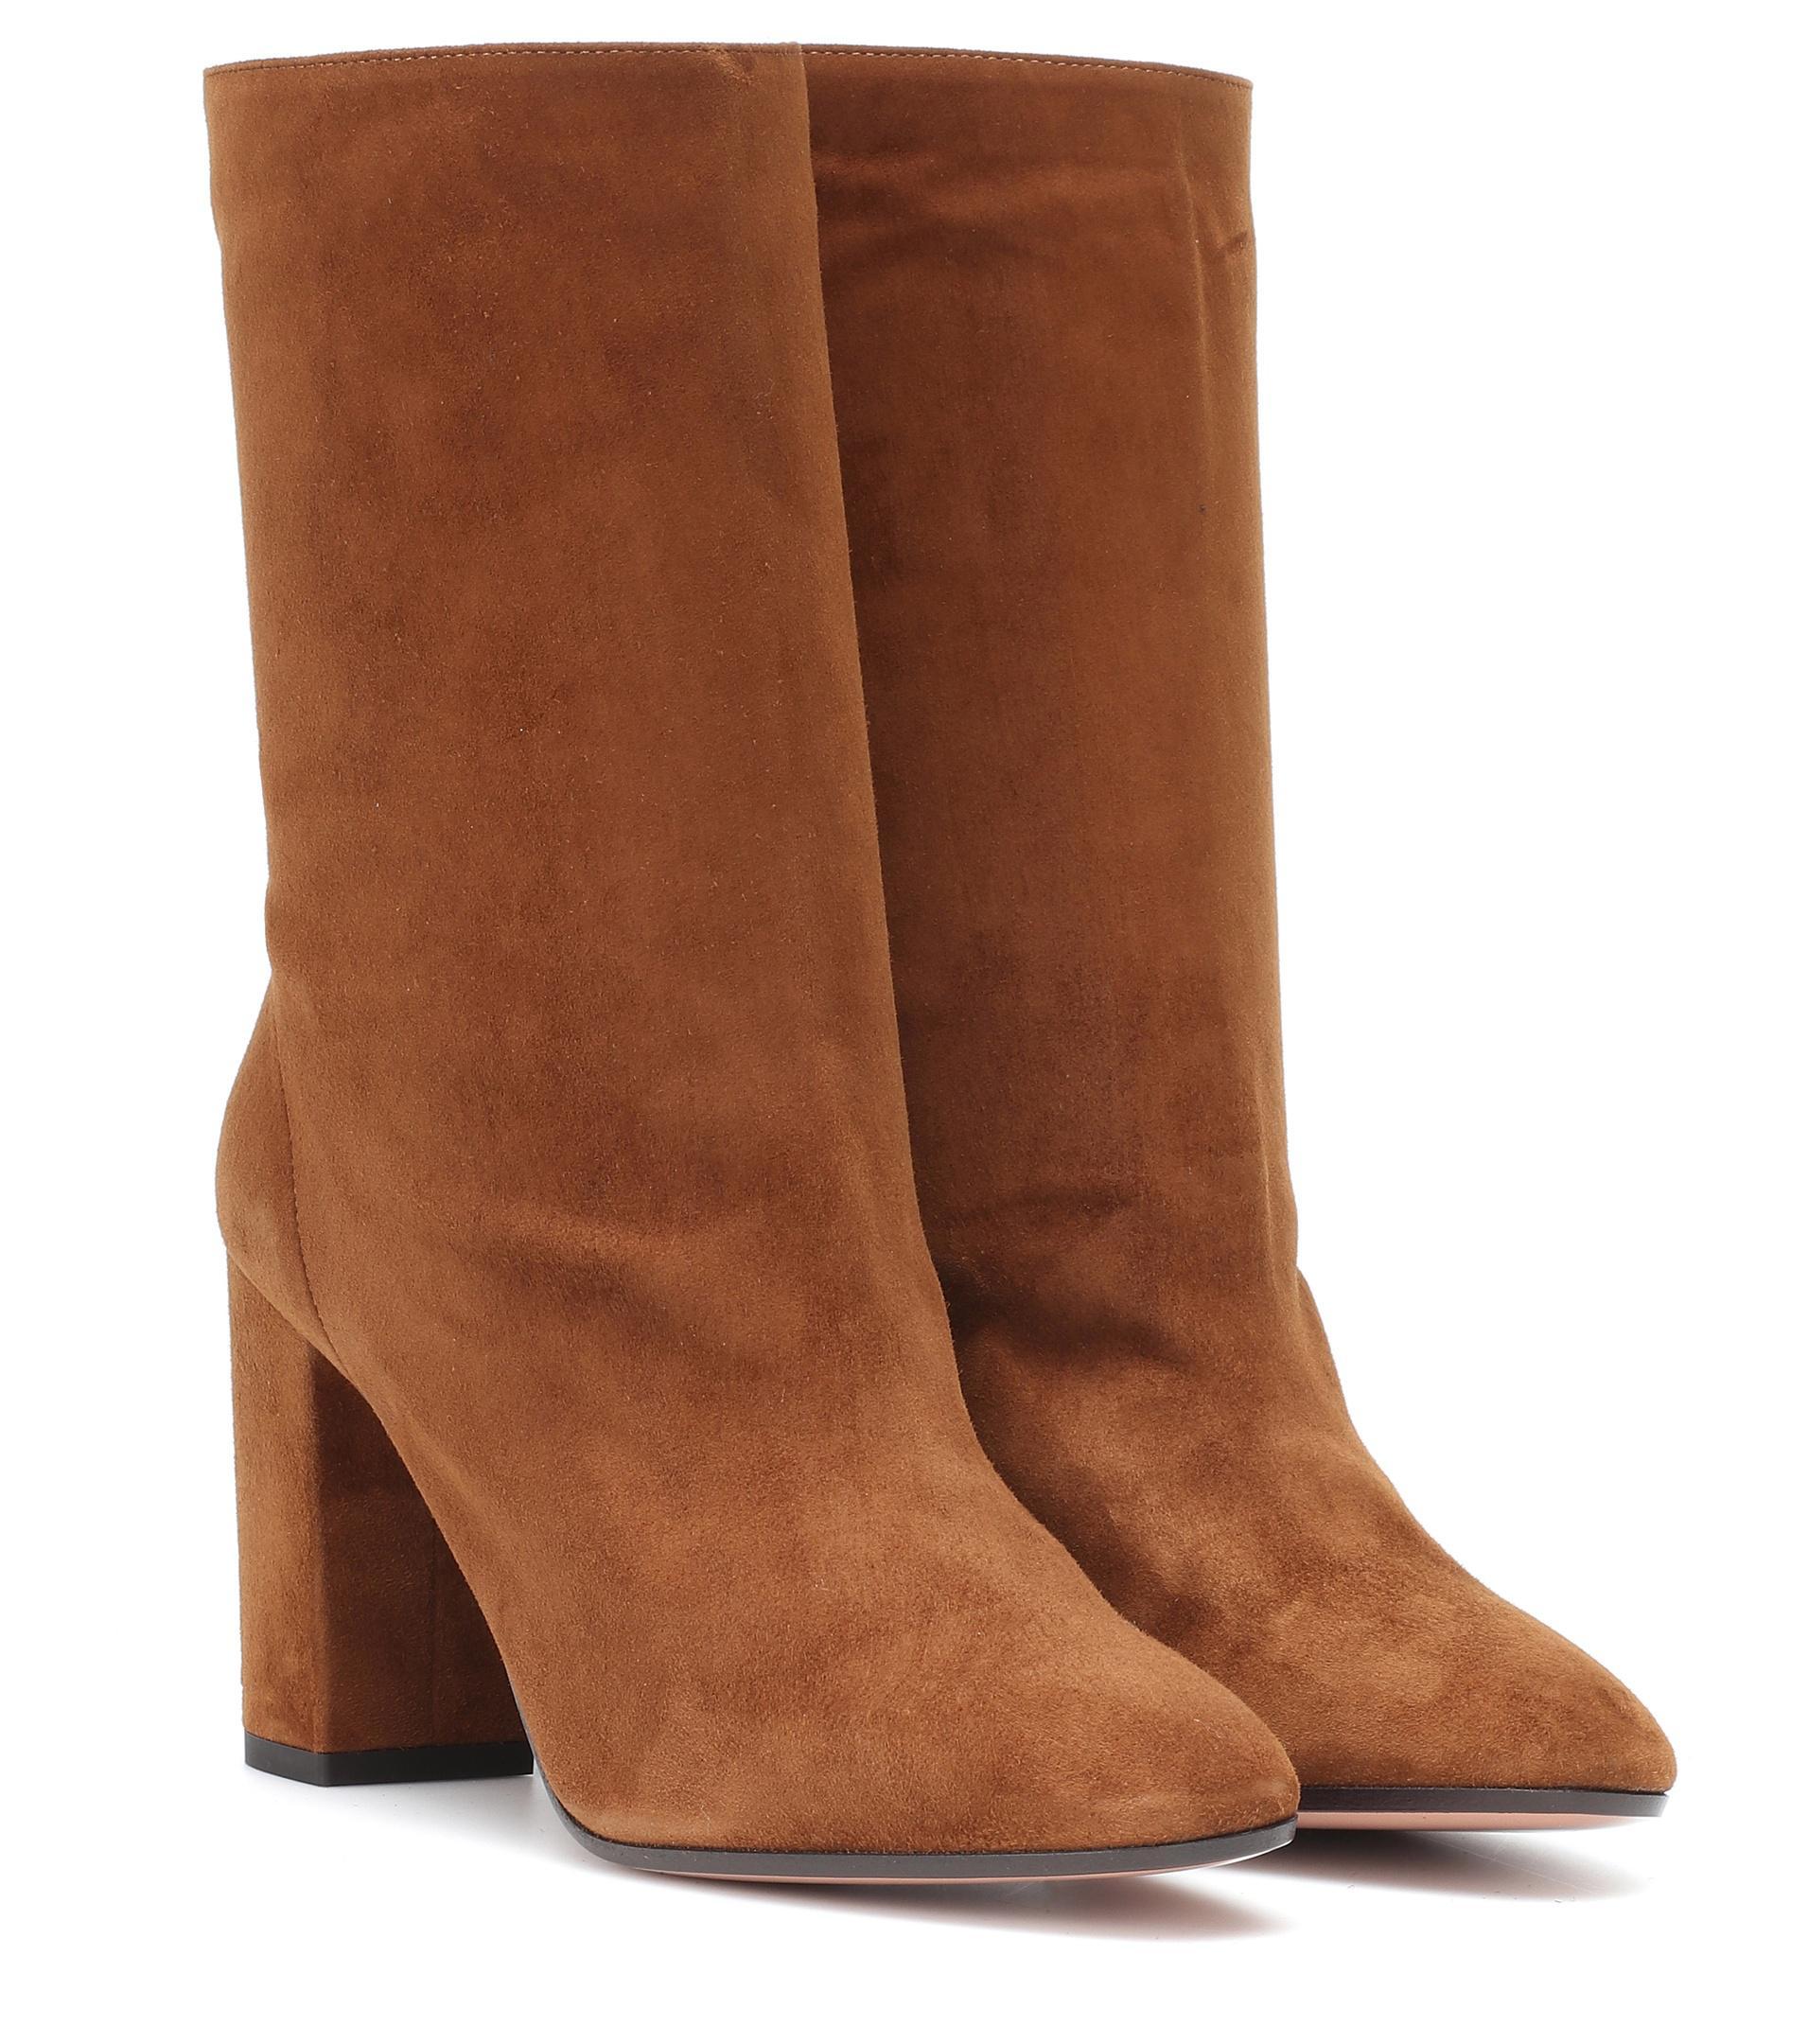 Lyst Aquazzura Ankle Boots Boogie 85 in Braun